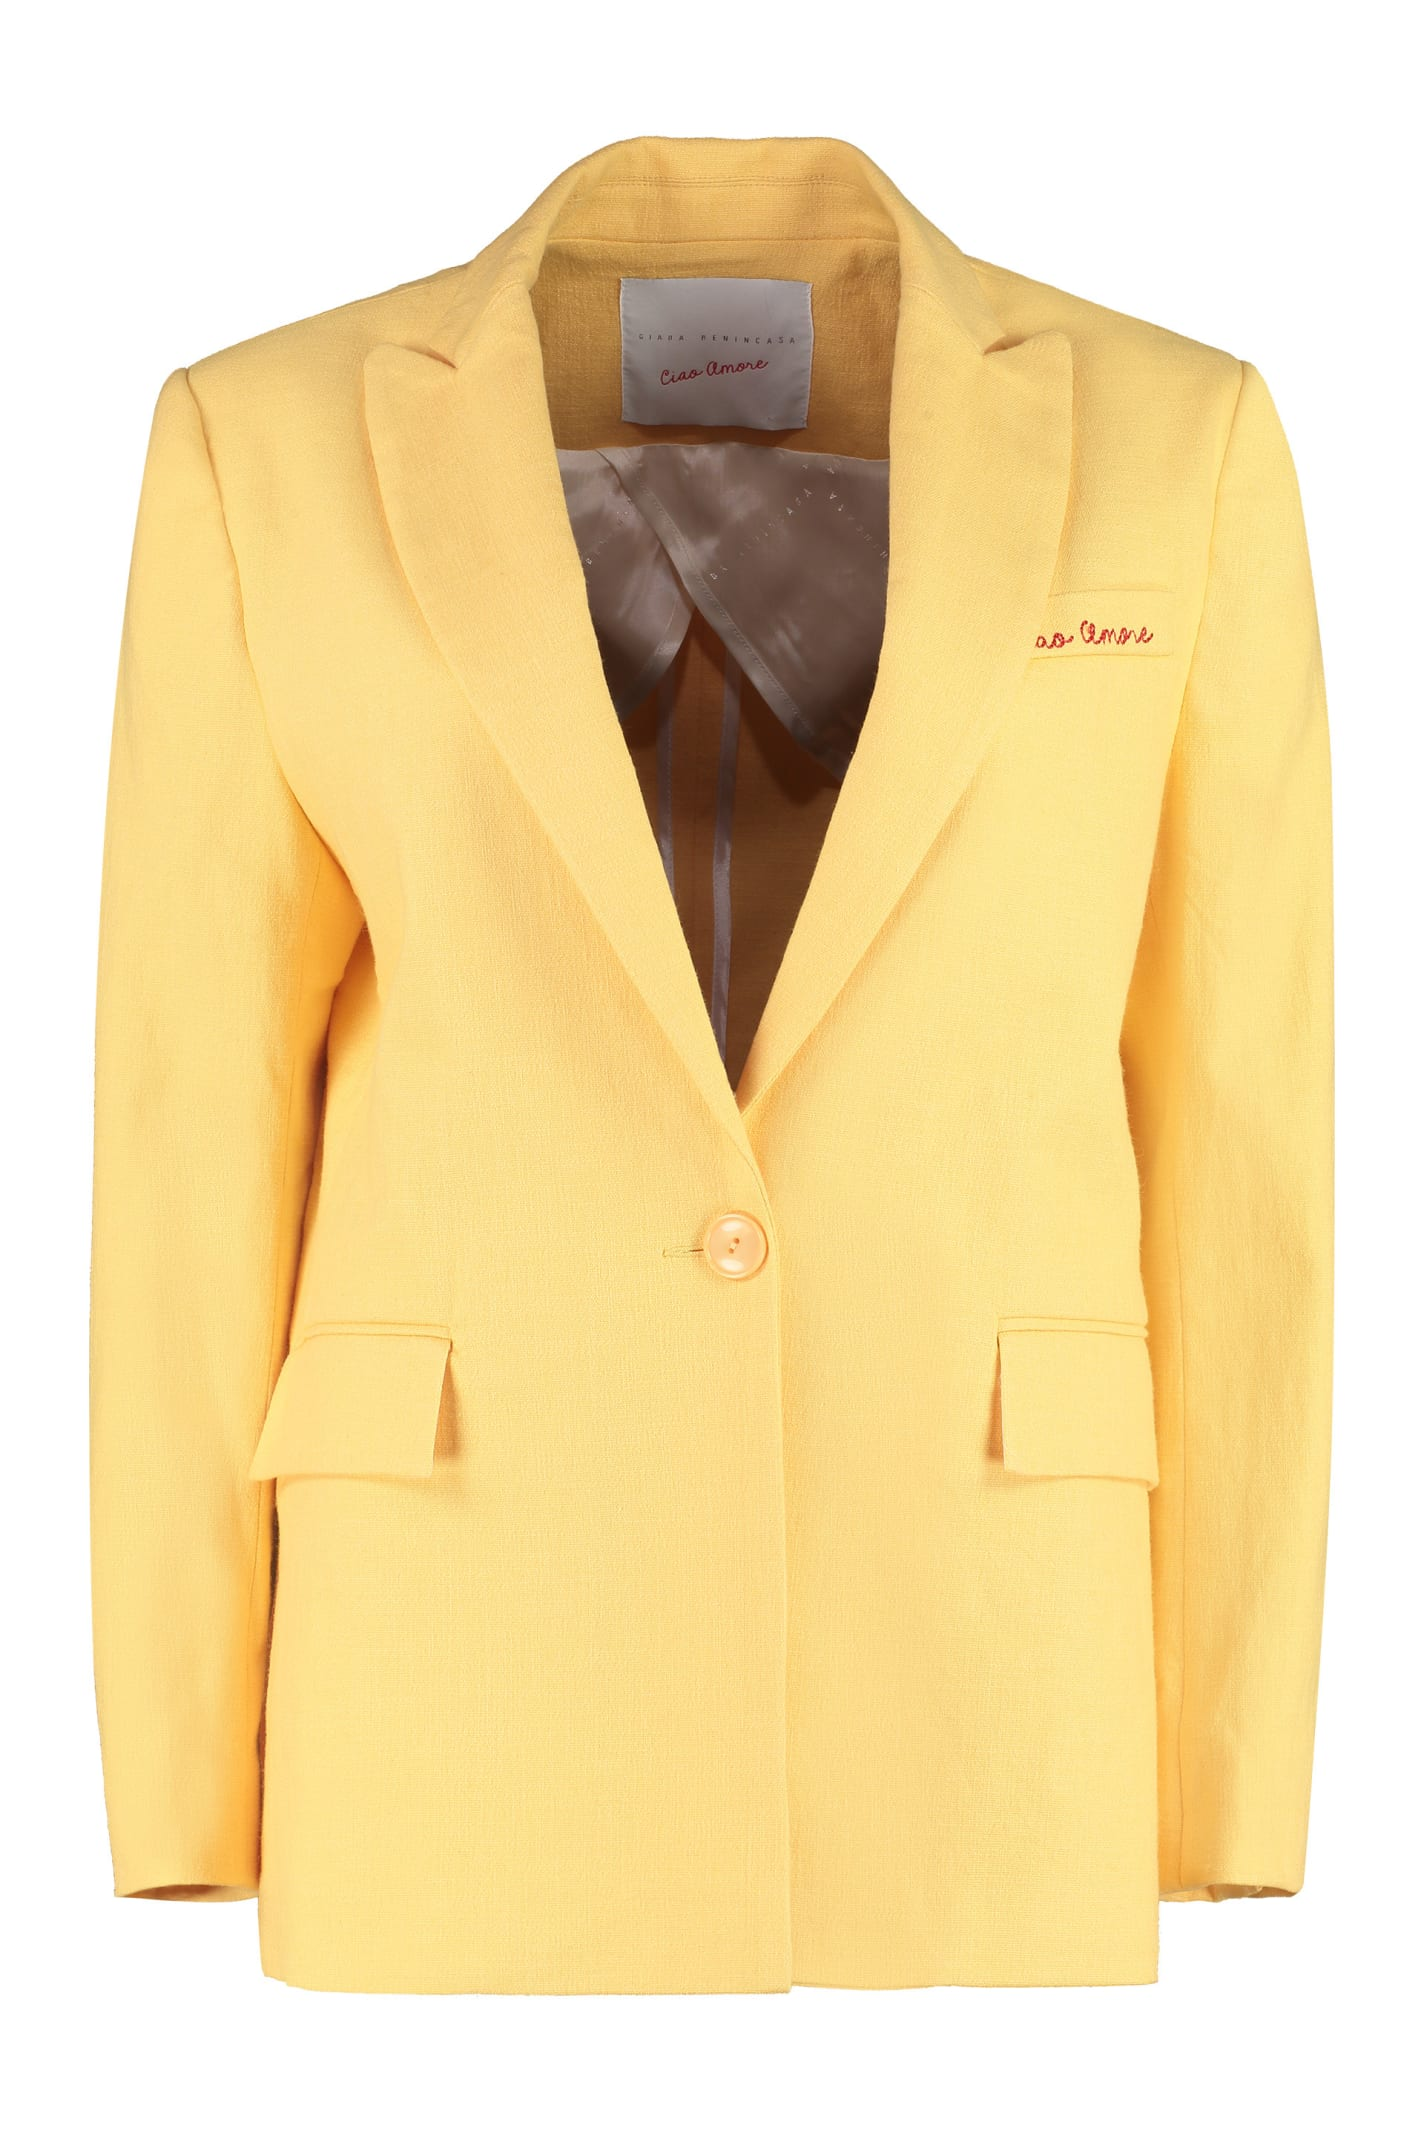 Giada Benincasa Single-breasted One Button Jacket